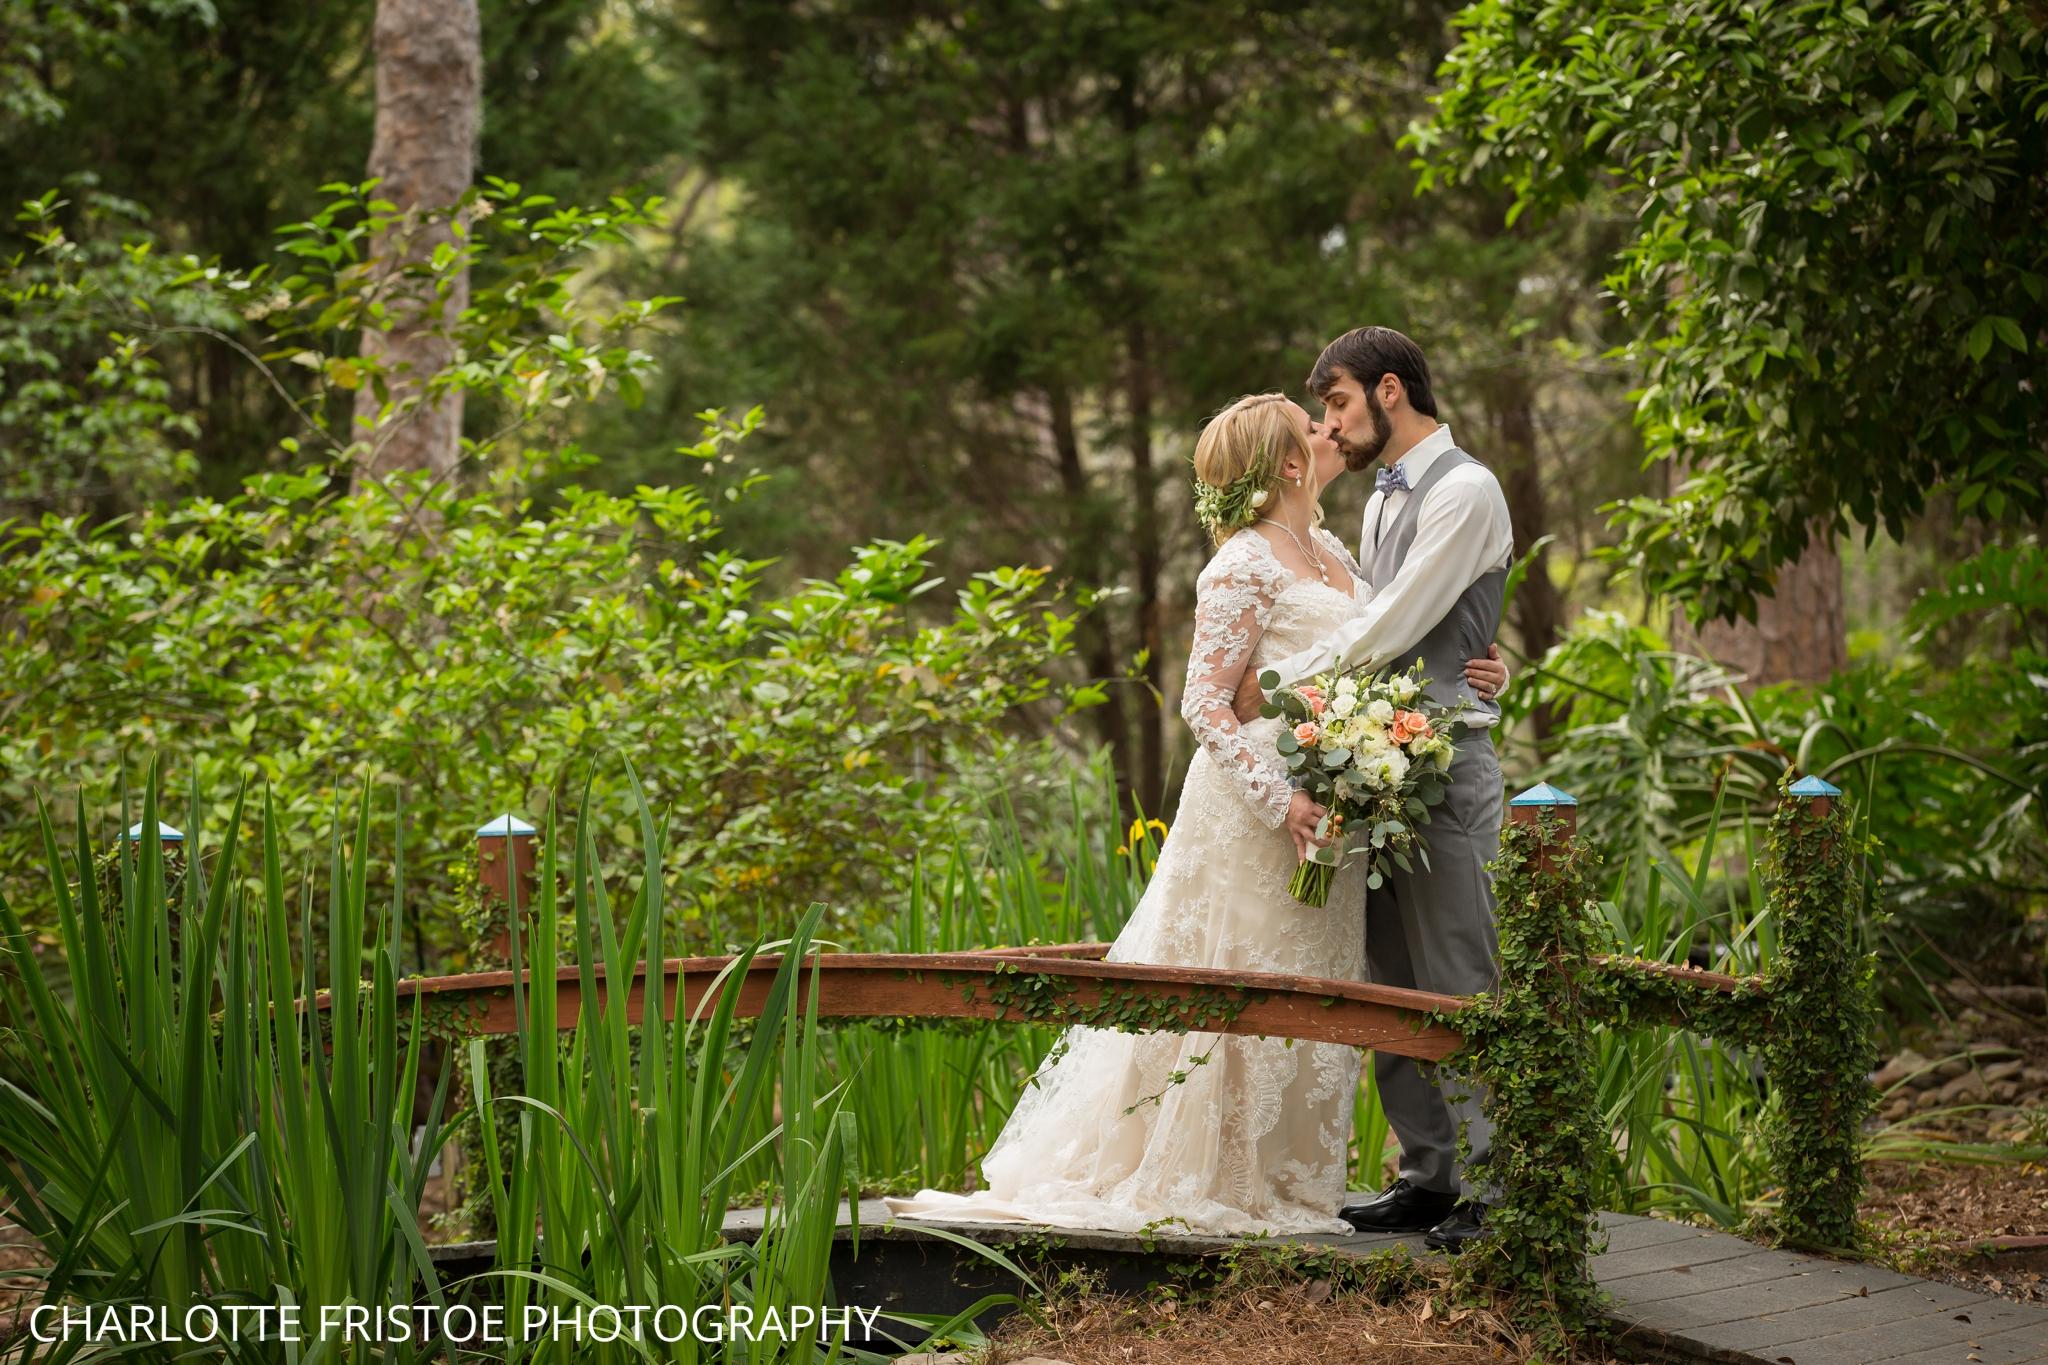 Charlotte Fristoe Photography Wedding-58.jpg